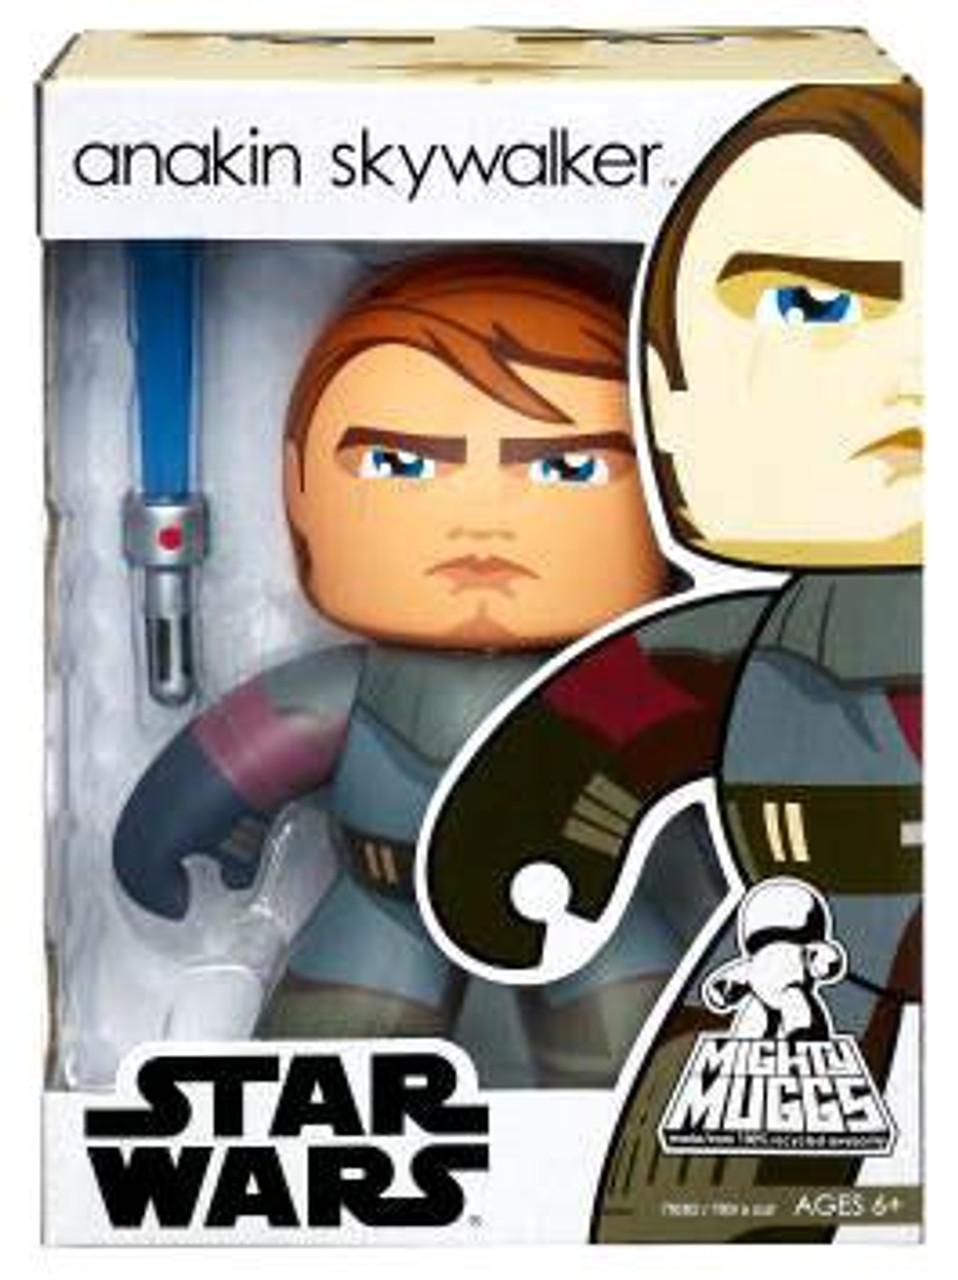 Star Wars The Clone Wars Mighty Muggs Wave 5 Clone Wars Anakin Skywalker Vinyl Figure